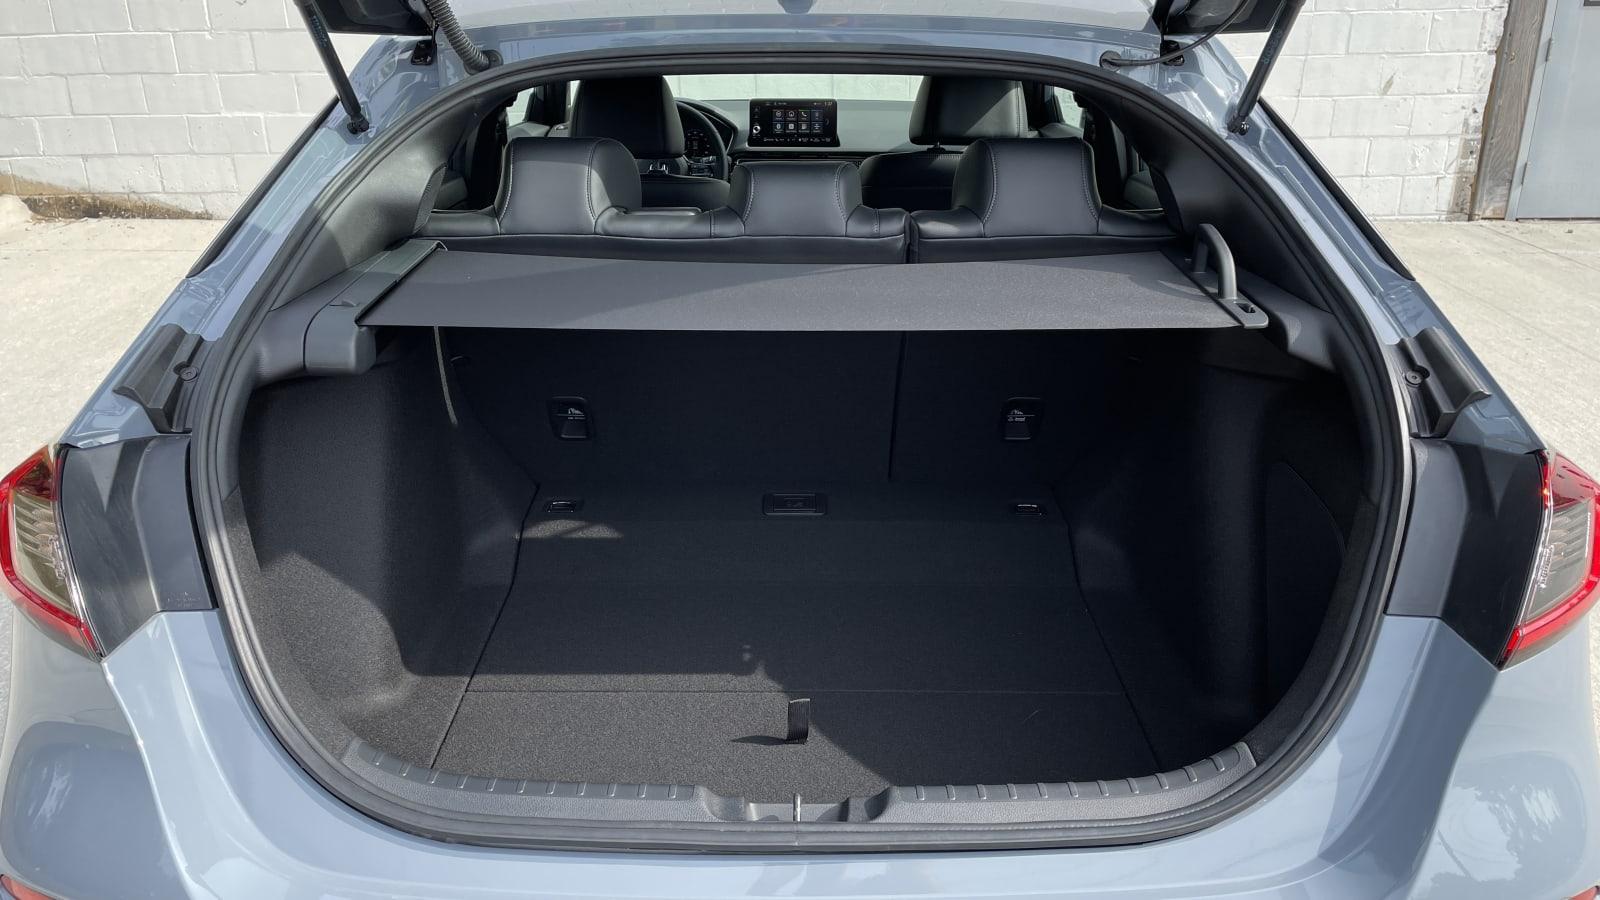 2022 Honda Civic Hatchback First Drive